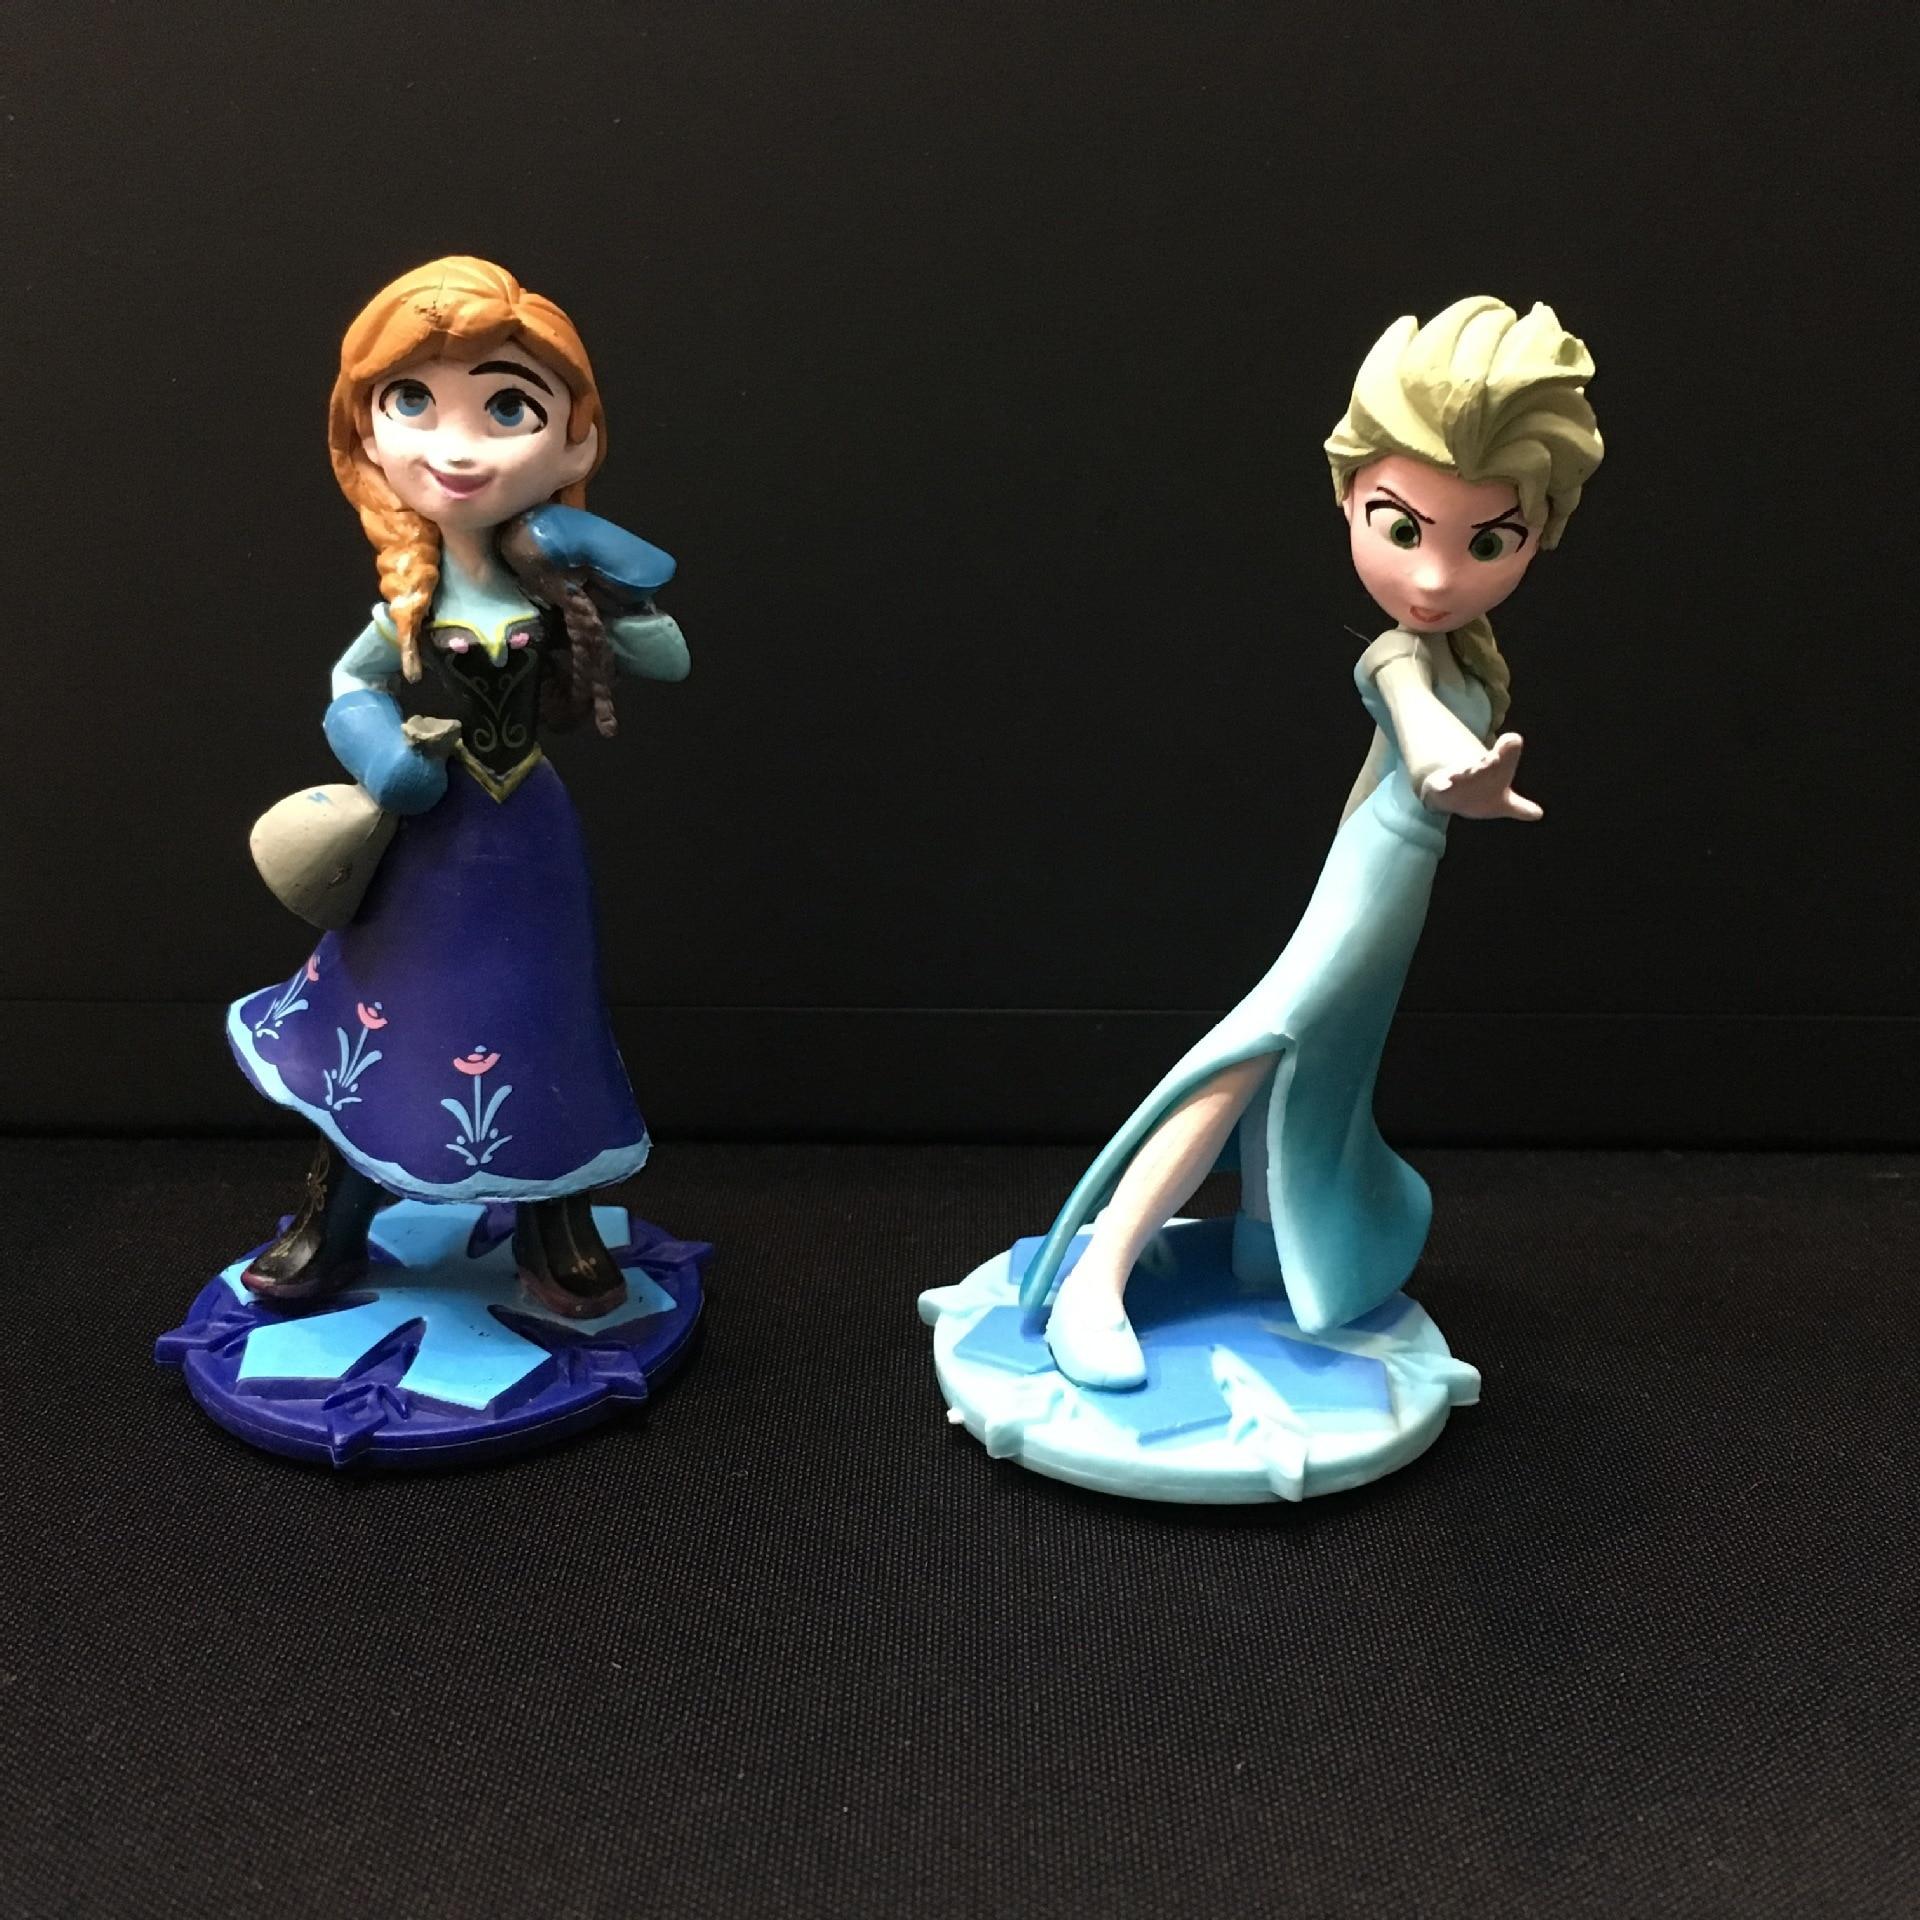 9cm Elsa Anna Princess Hand Action anime Figure Model Toys Decoration toys for children Christmas gift